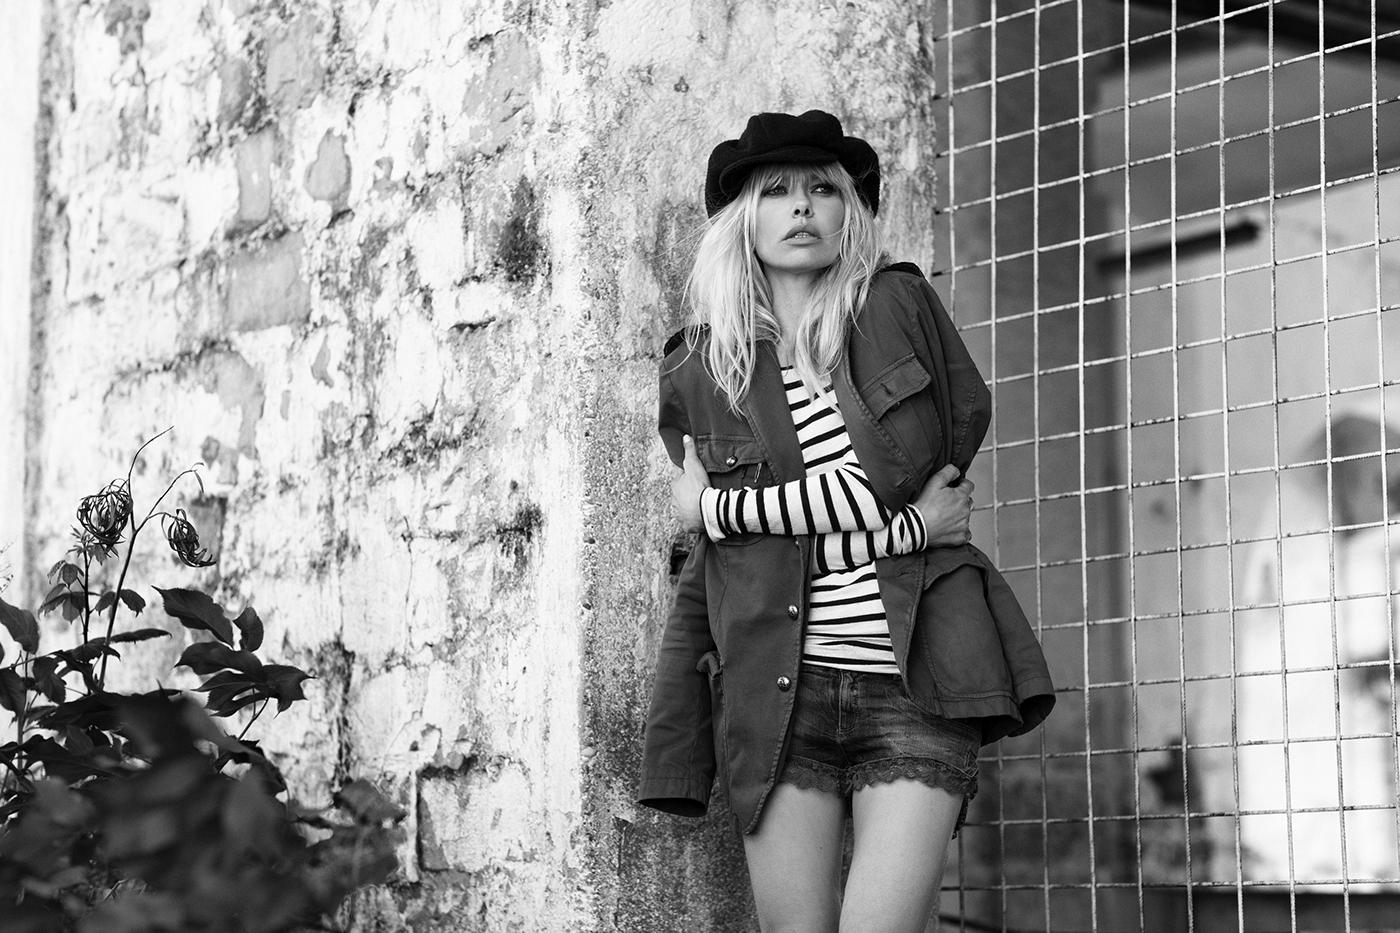 Barbara as BB / фотограф Maurizio Melozzi модель Barbara Schnellenburg